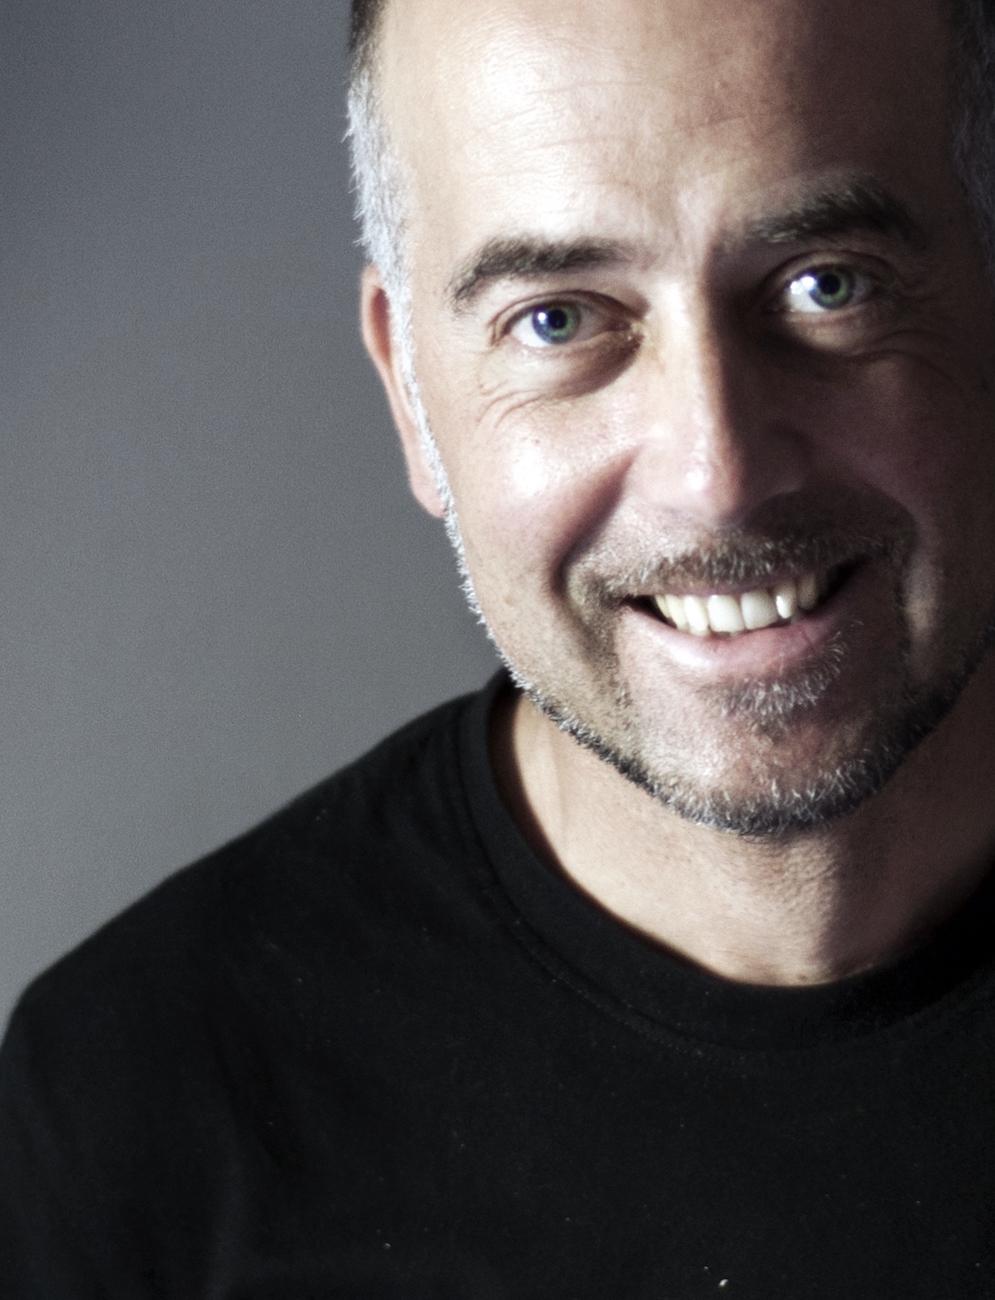 Luca Coassin